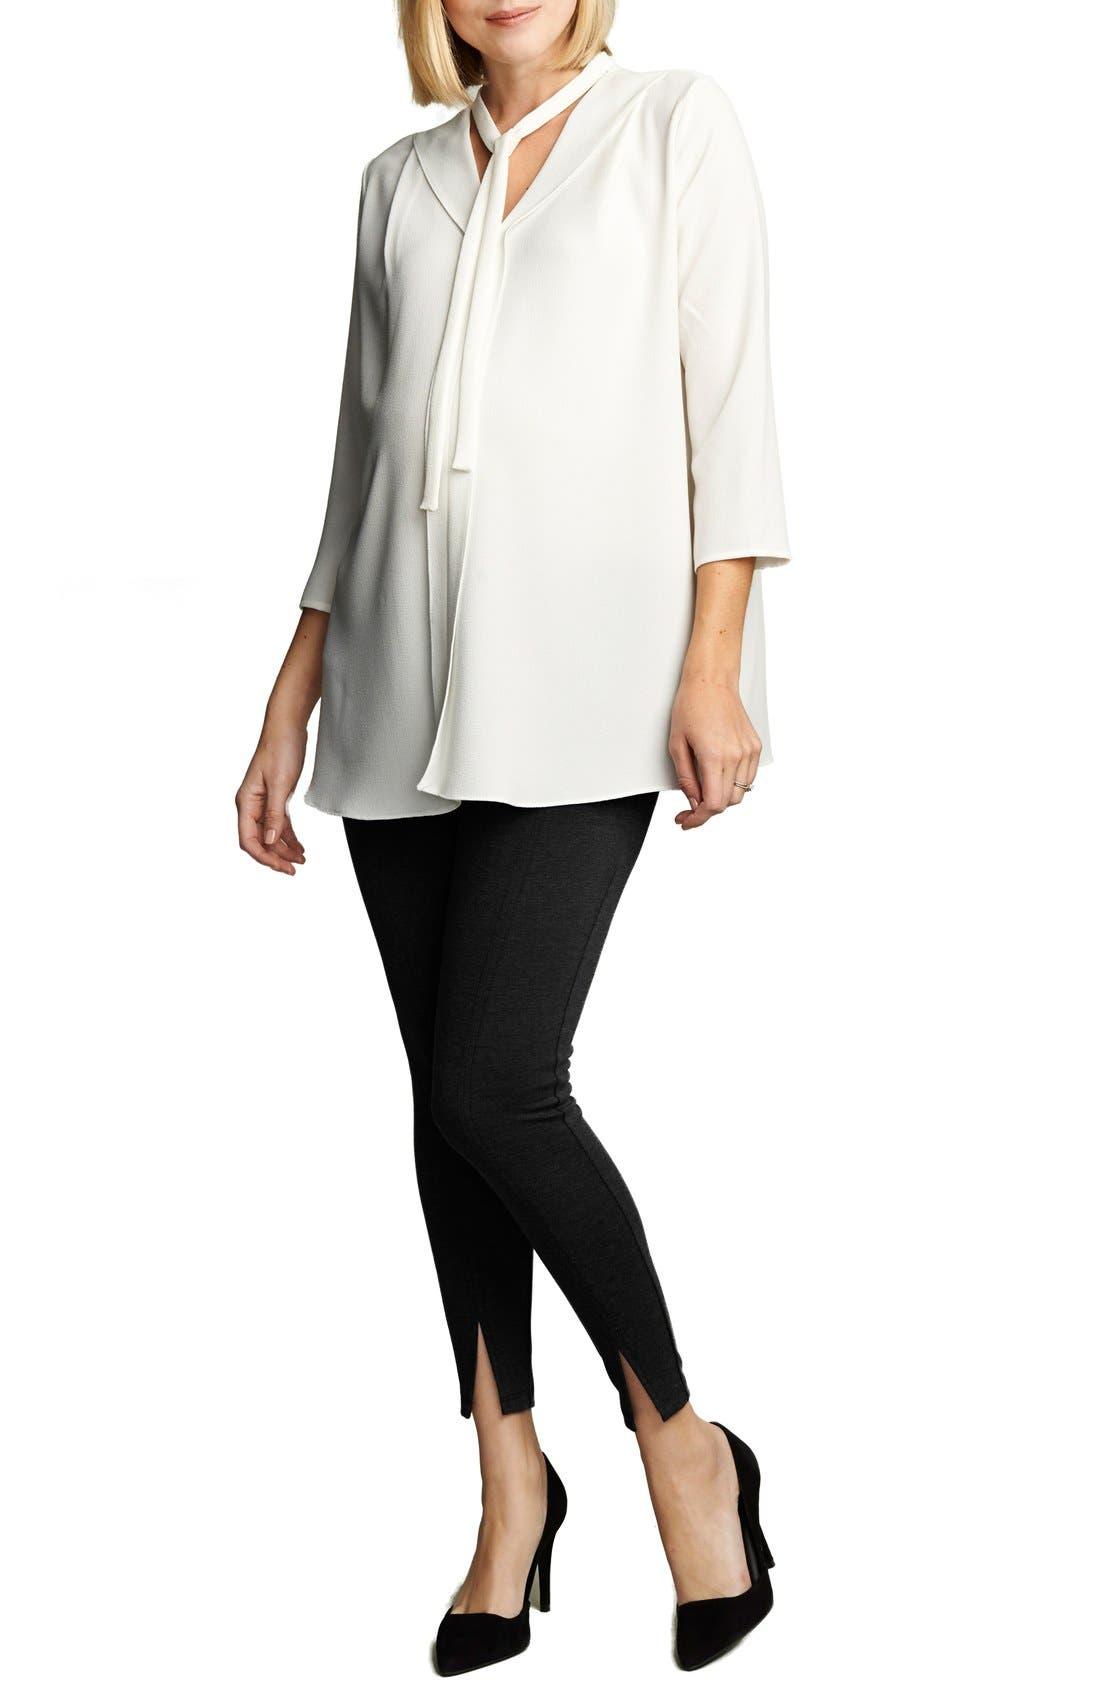 77d44c98e5de9 maternal america pants & leggings activewear for women - Buy best women's  maternal america pants & leggings activewear on Cools.com Shop